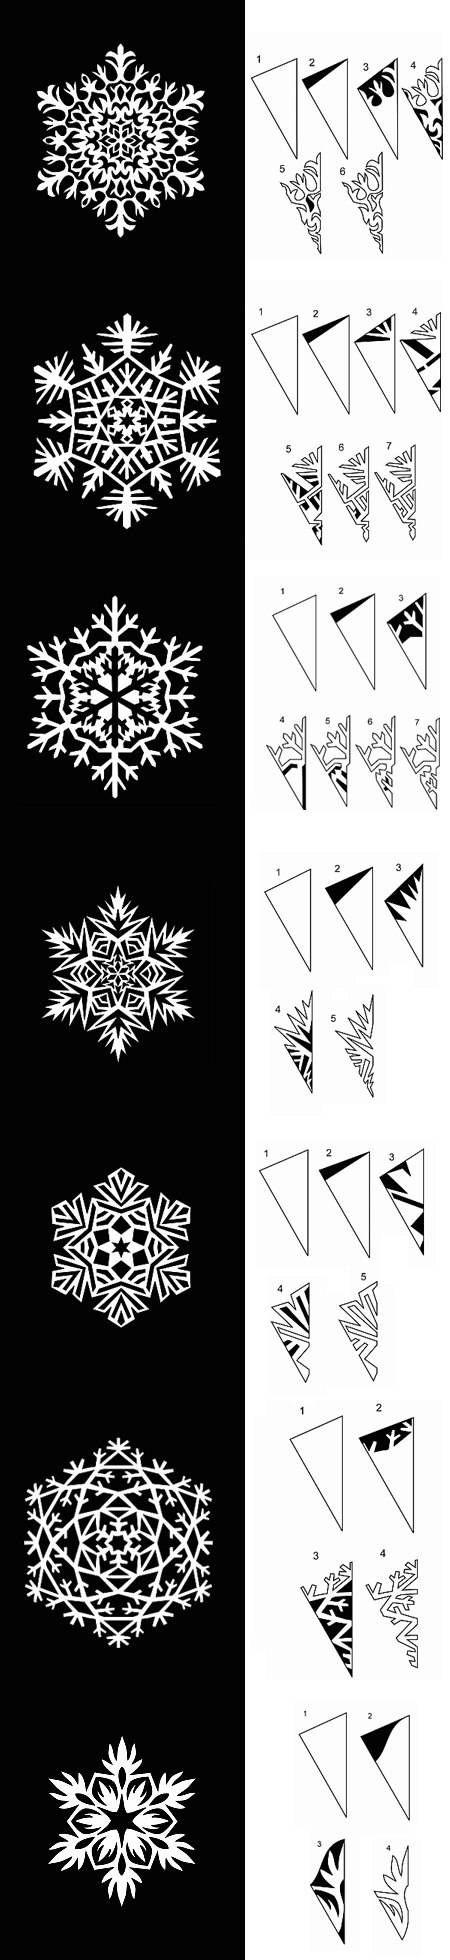 DIY Paper Snowflakes Templates DIY Paper Snowflakes Templates